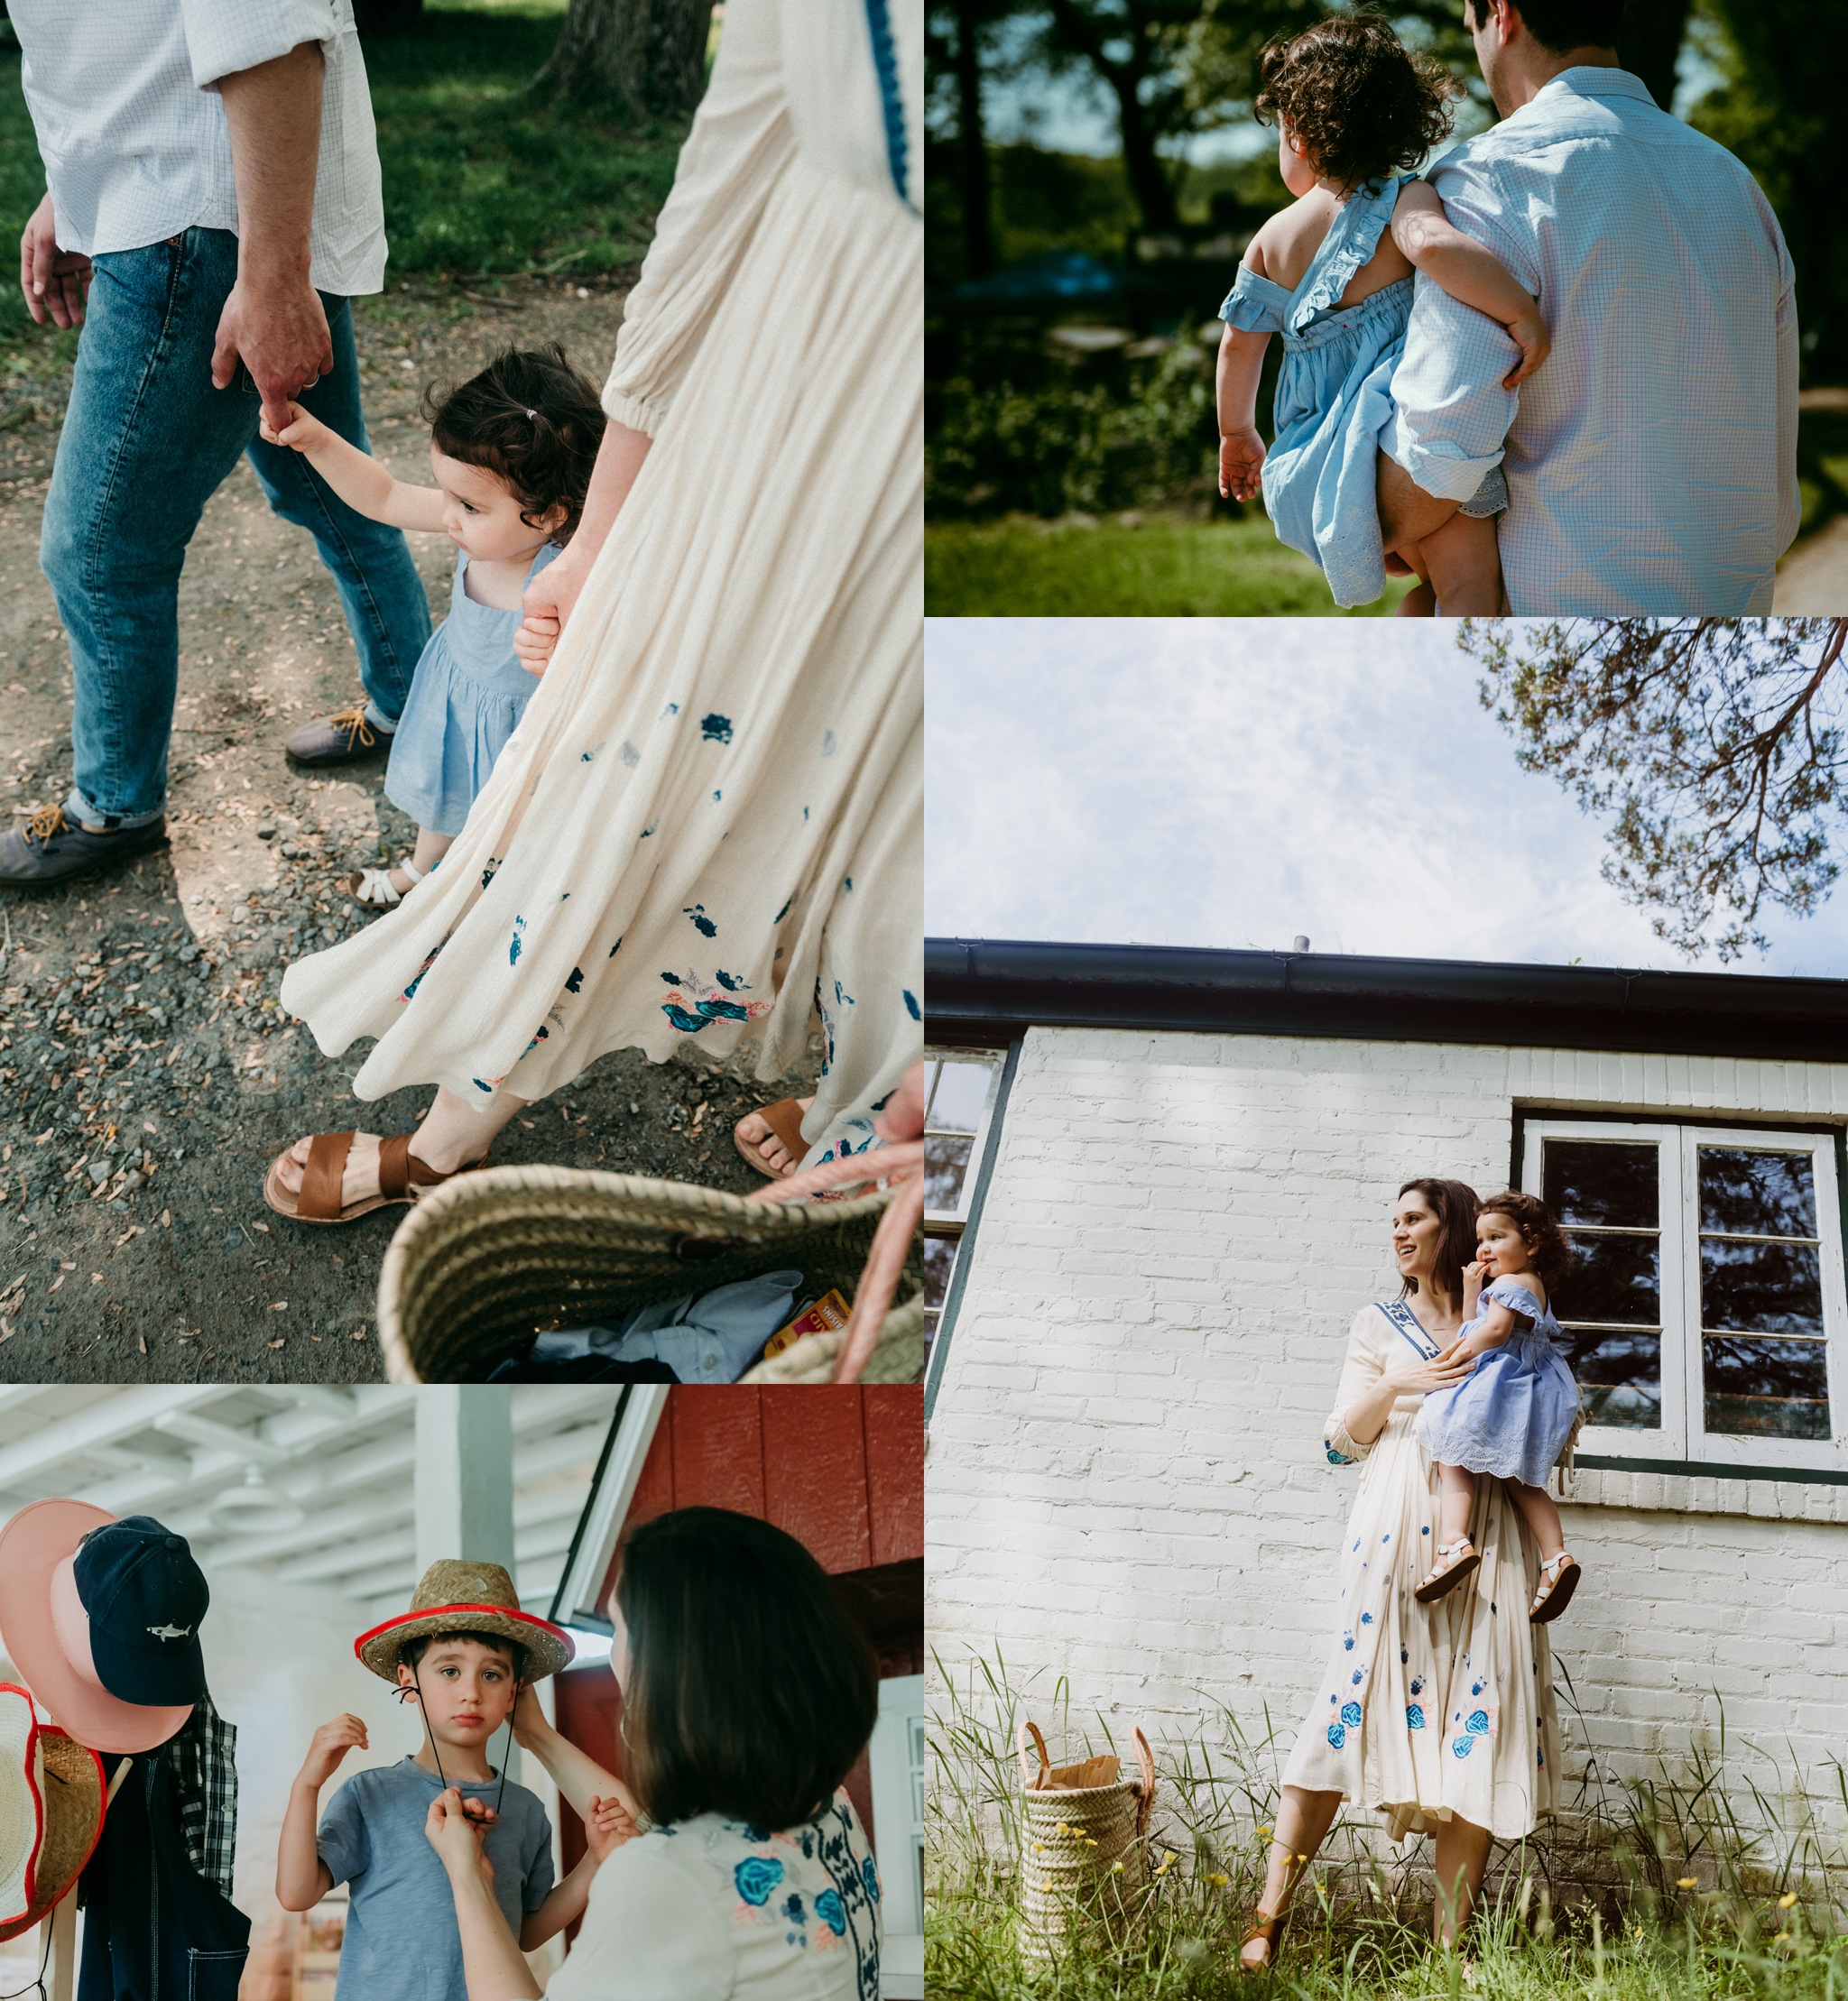 amy-drucker-lifestyle-family-photography-7.jpg